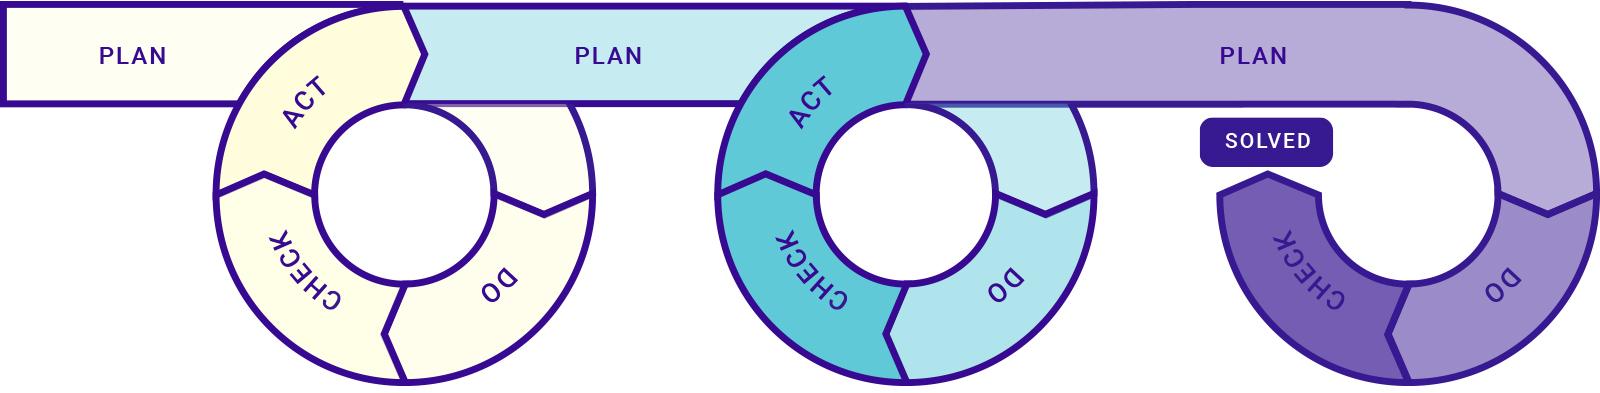 Agile development approaches